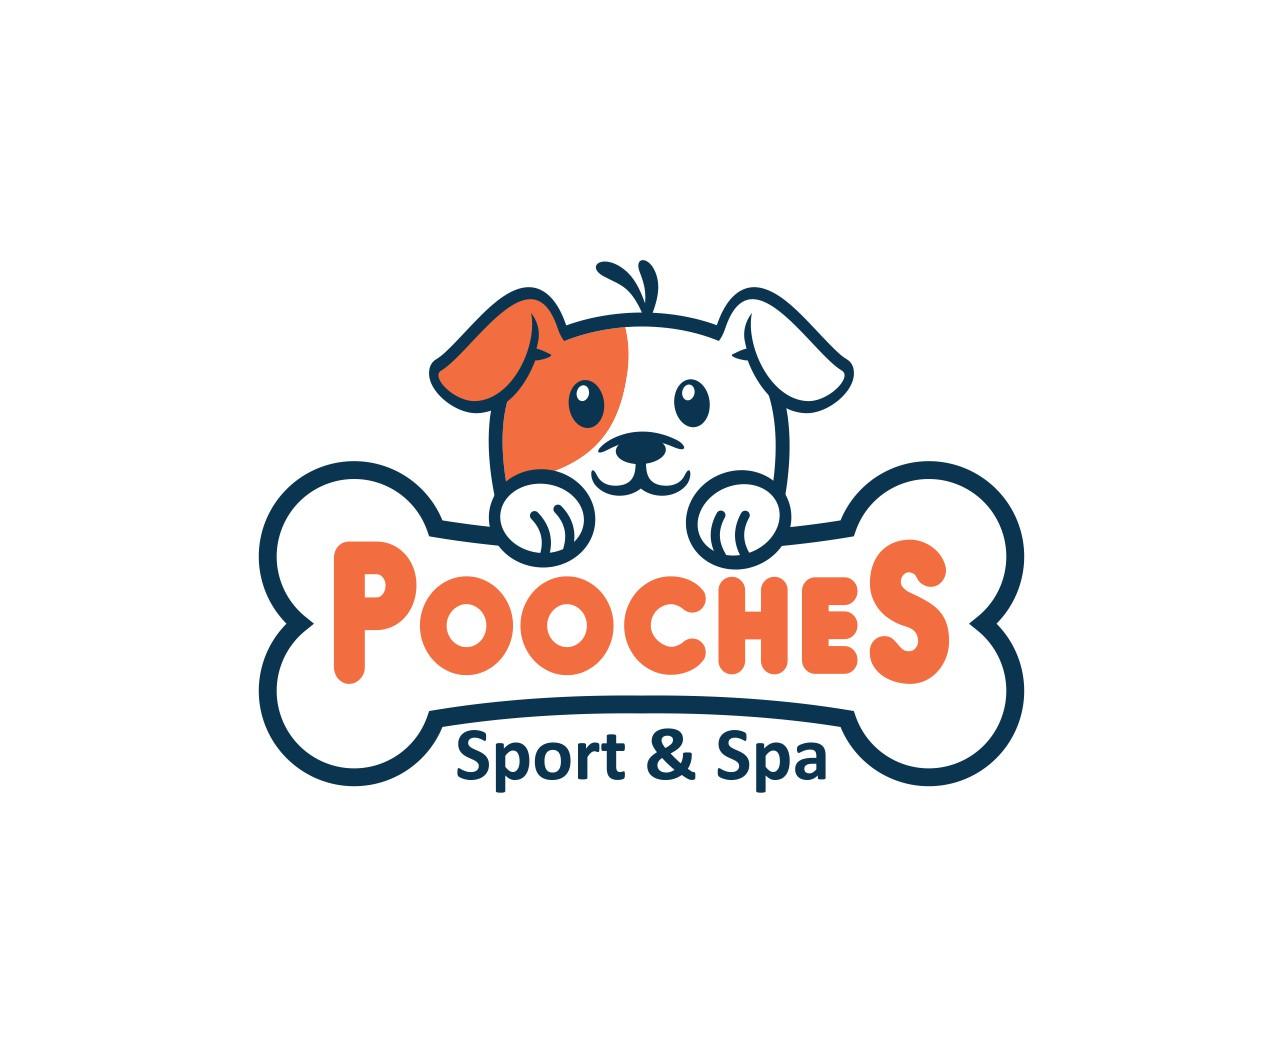 Design a hip, fun logo for Pooches LIC Doggy Daycare!